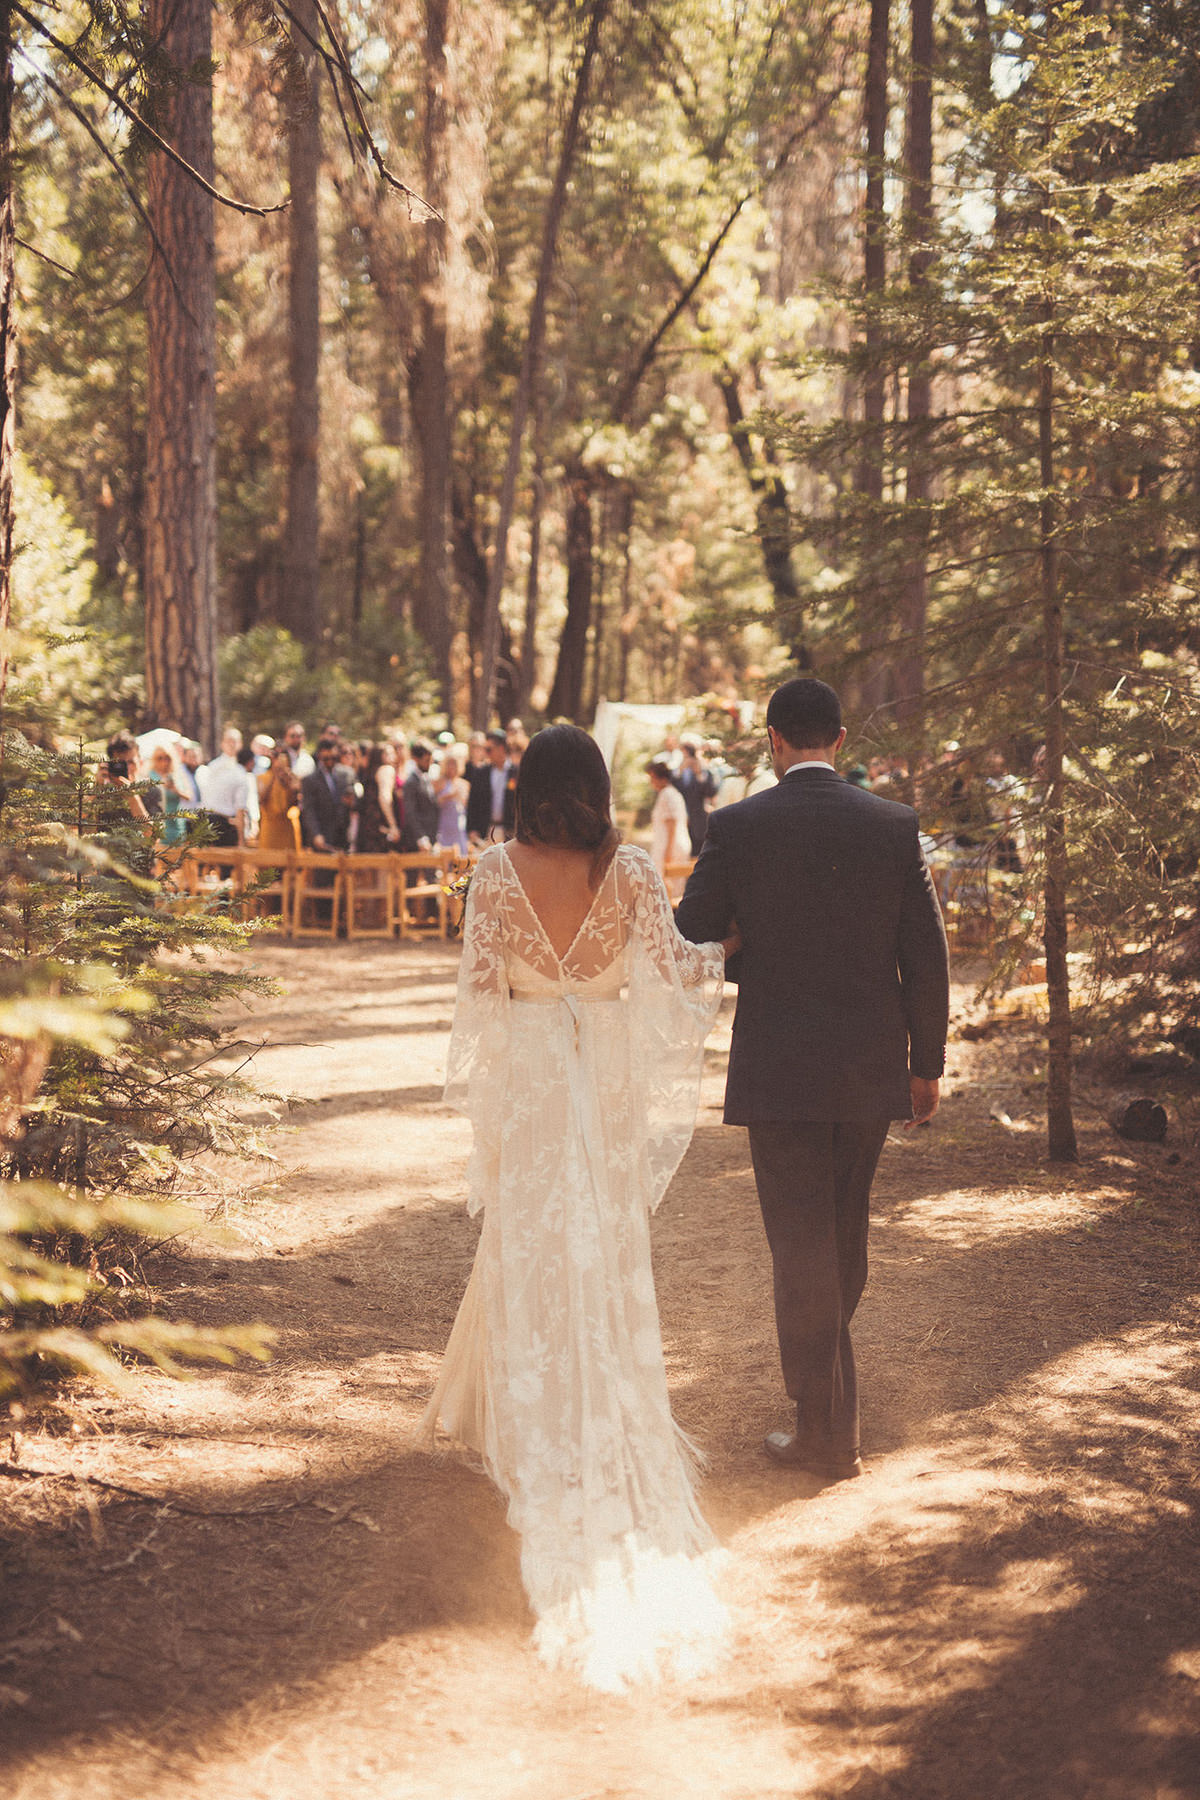 S&J - Wedding Photography Yosemite National Park SJ Wedding Photography Yosemite 062